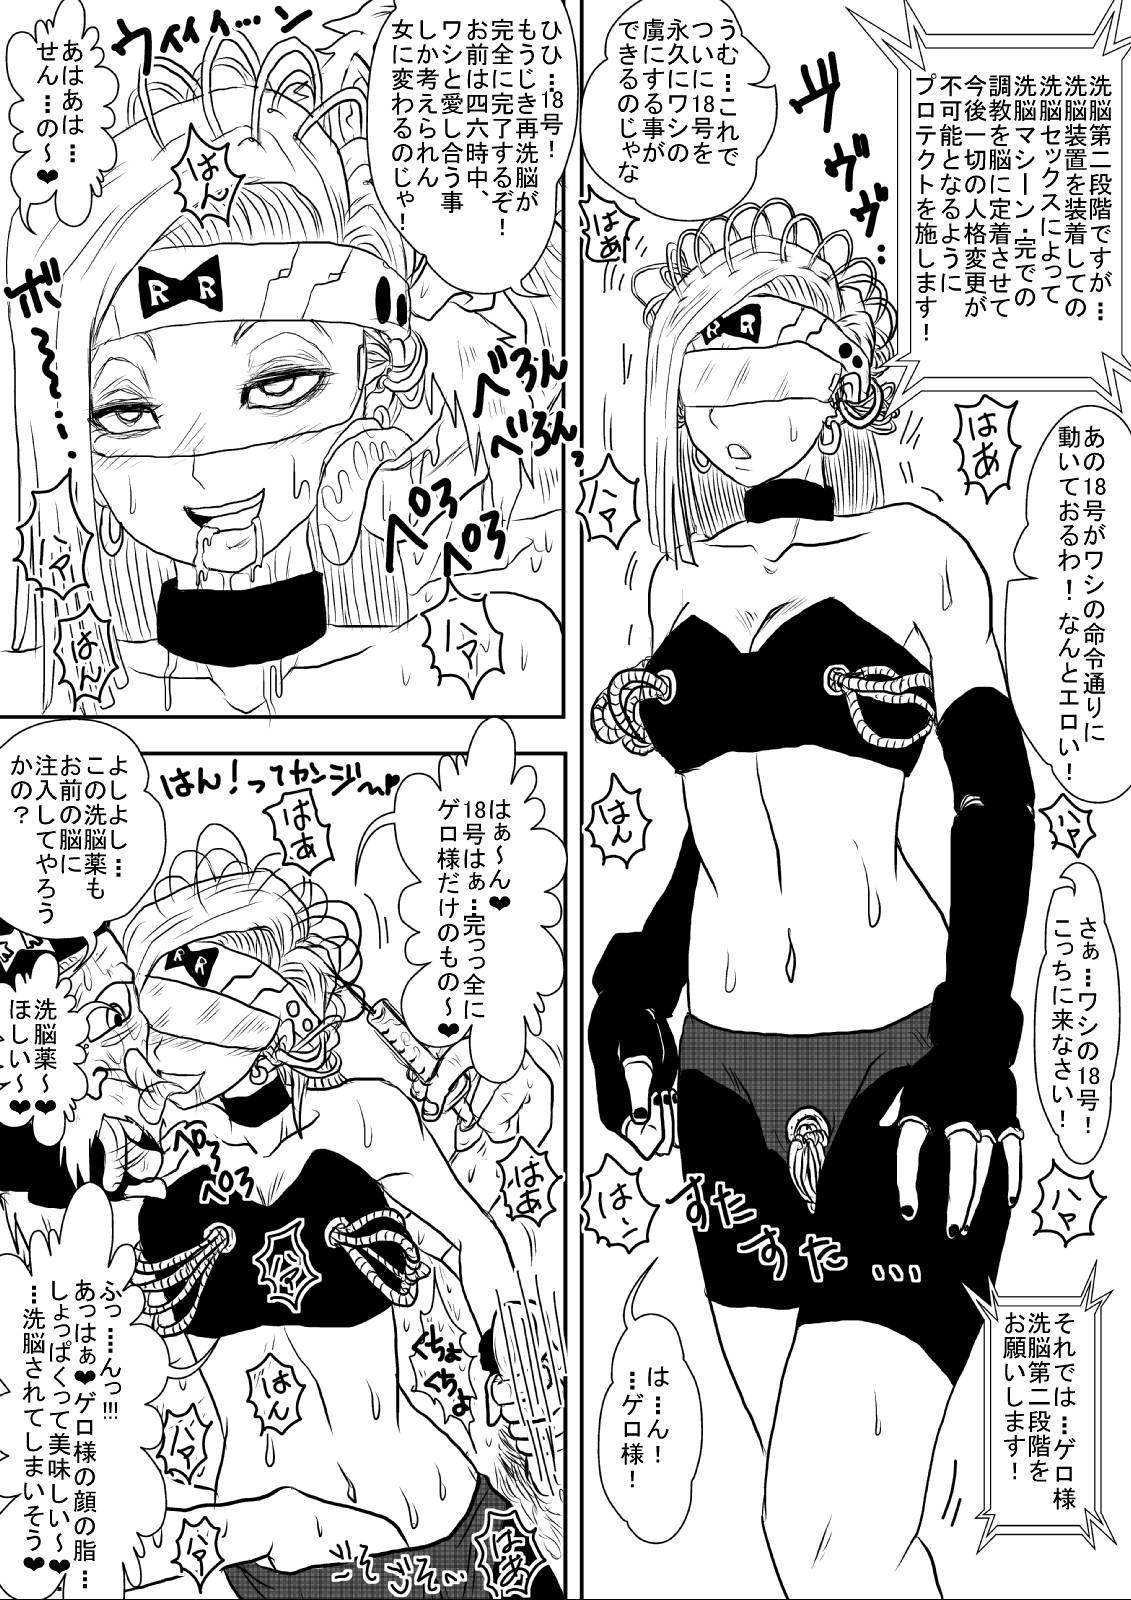 [Alice.Blood] Sennou Kyouiku-shitsu~ Jinzou ☆-kan 18-gou-hen (Dragon Ball Z) 33